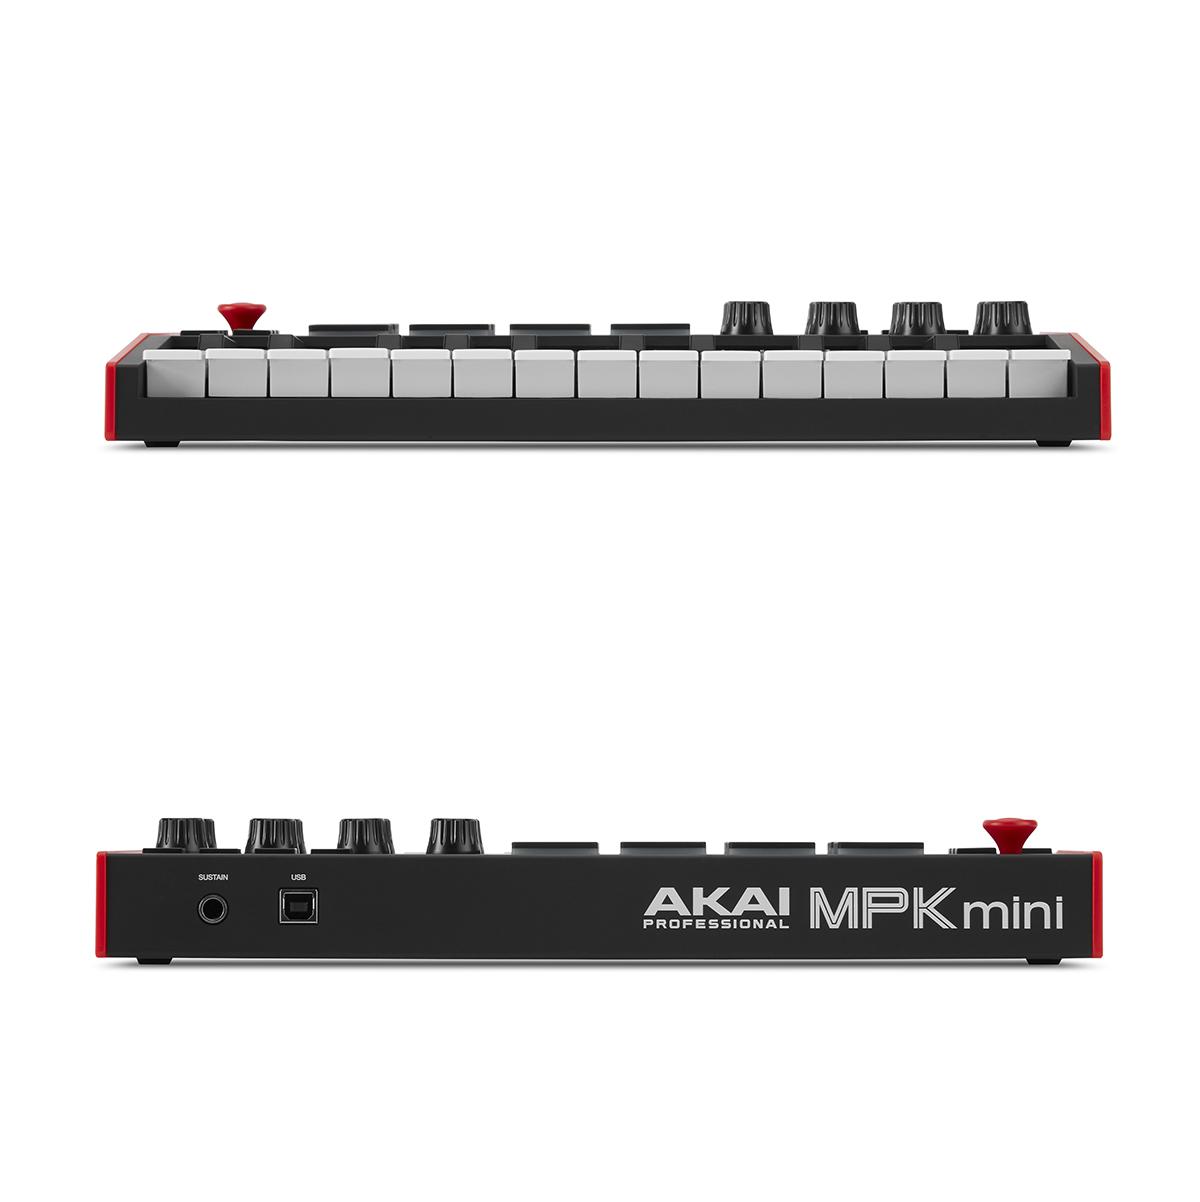 Controladora Akai Mpk Mini MK3 25 Teclas